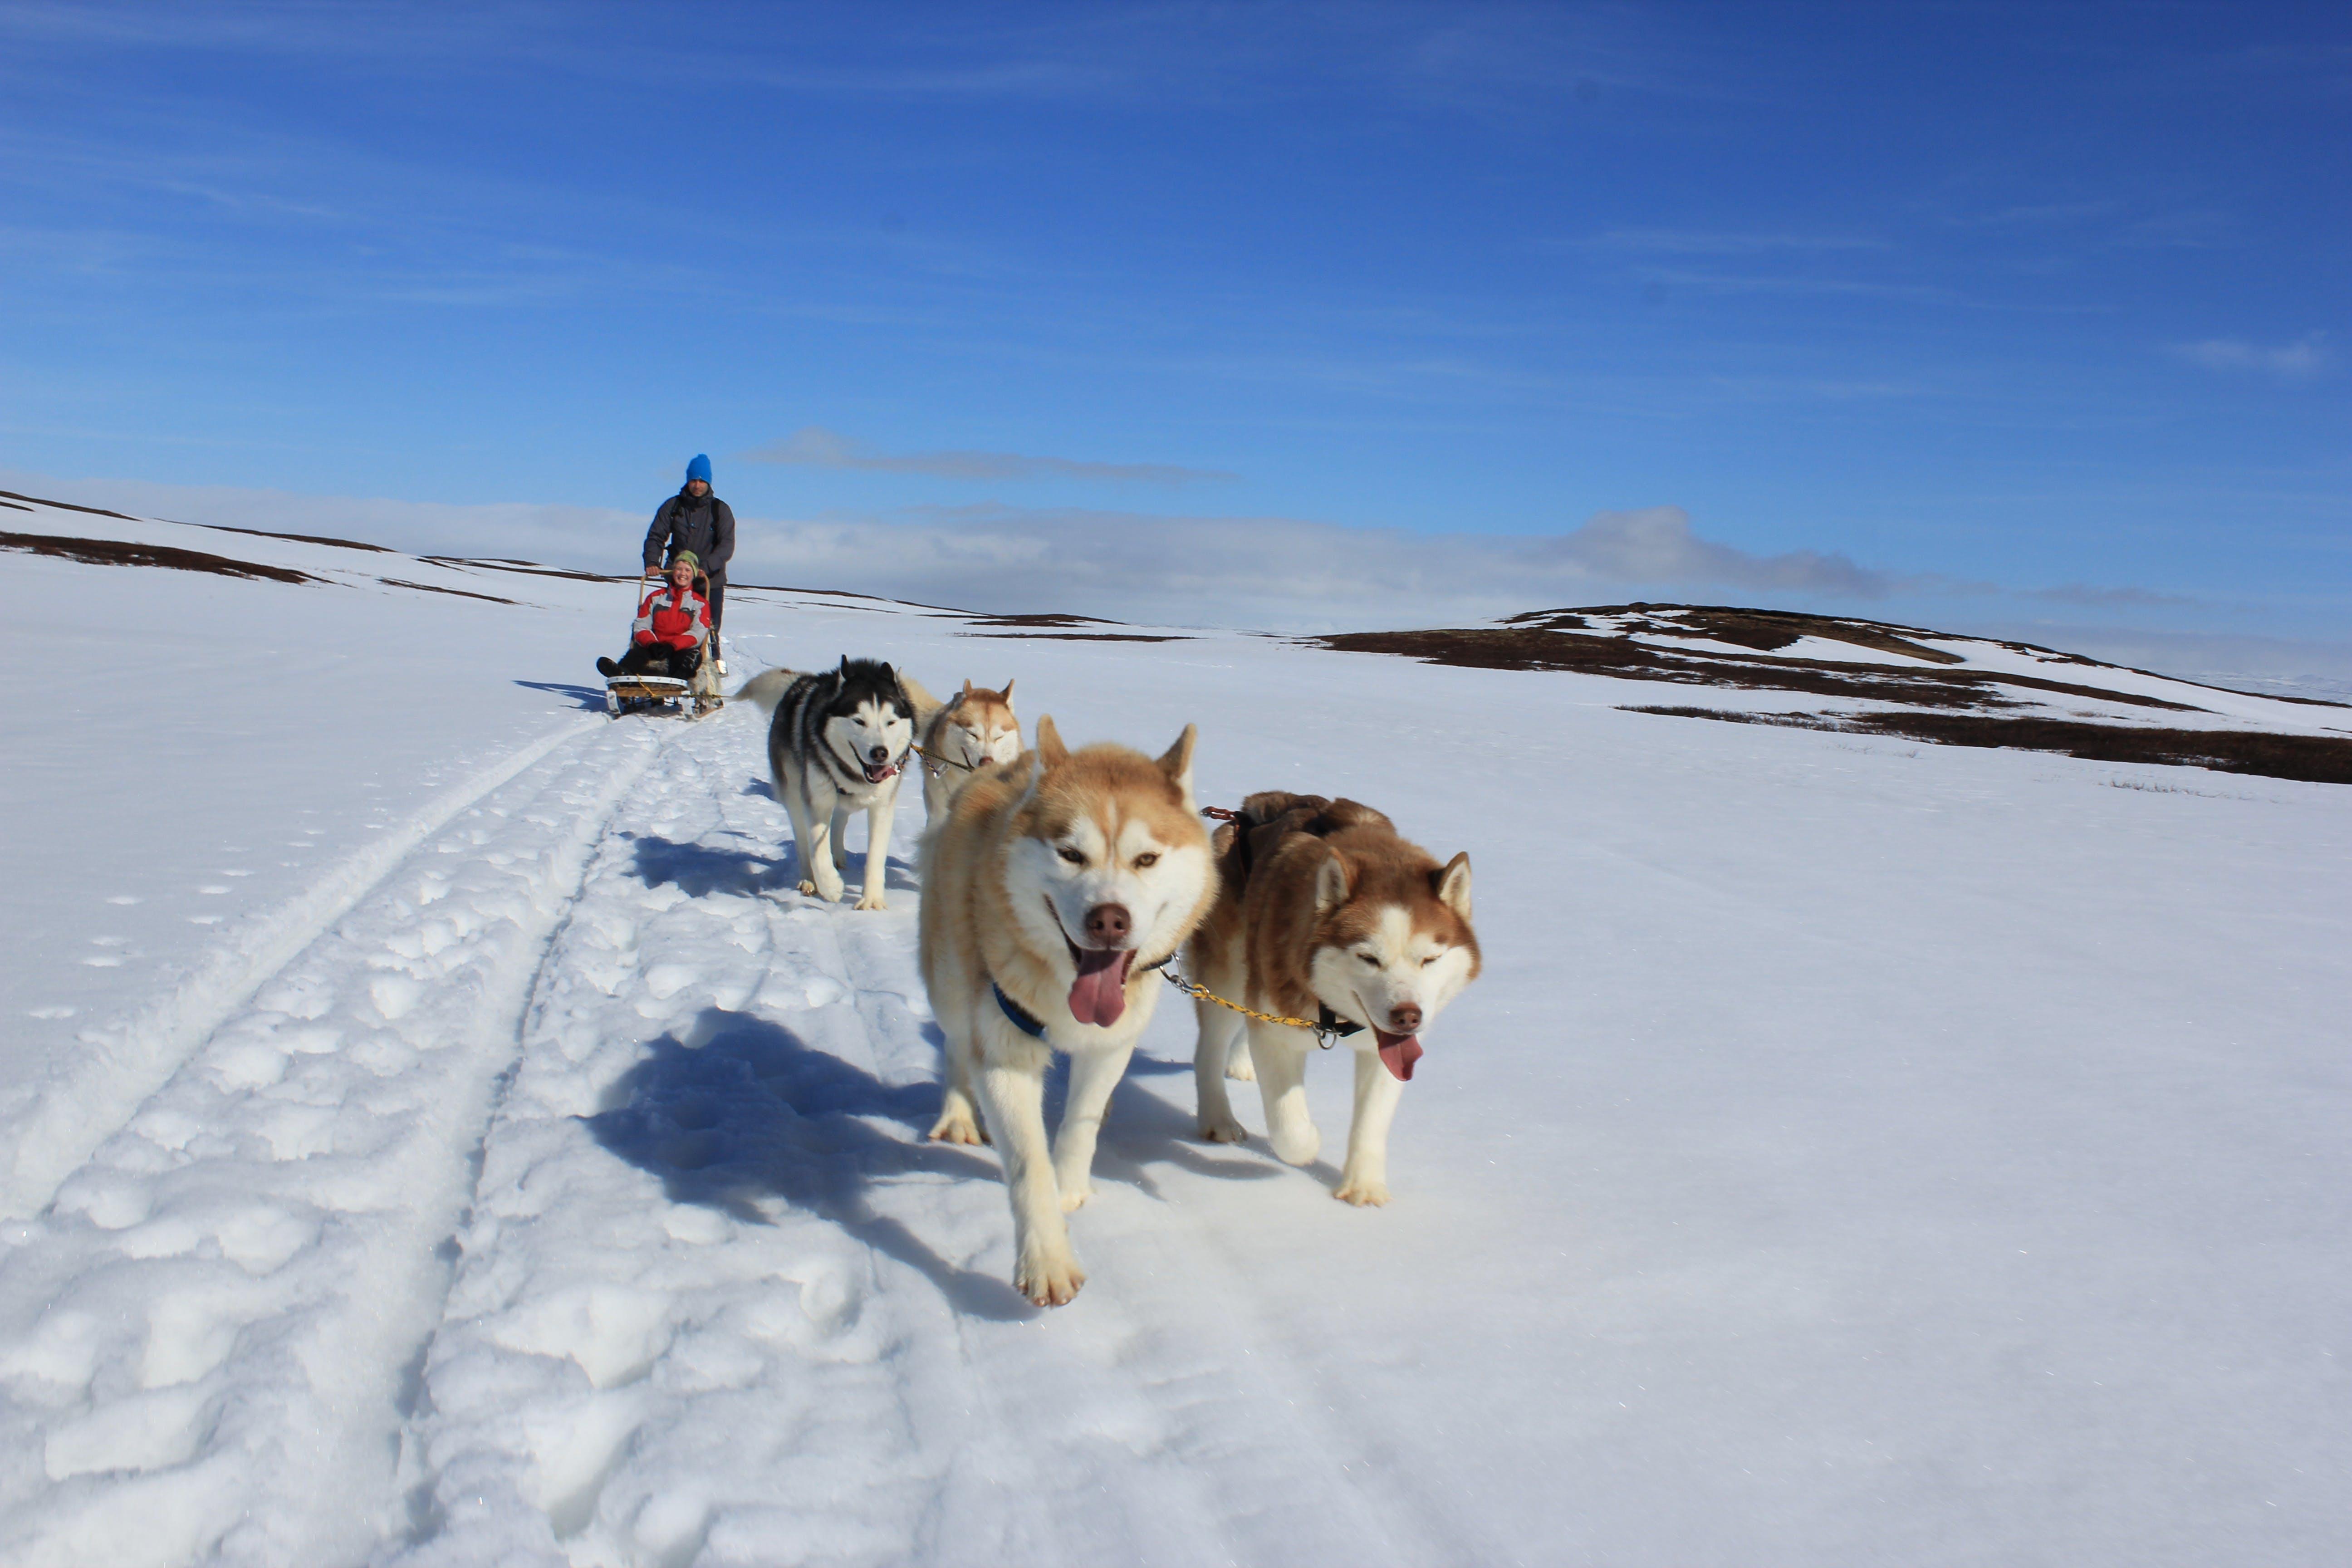 Siberian Husky Tour | Dog Sledding in the Myvatn Area